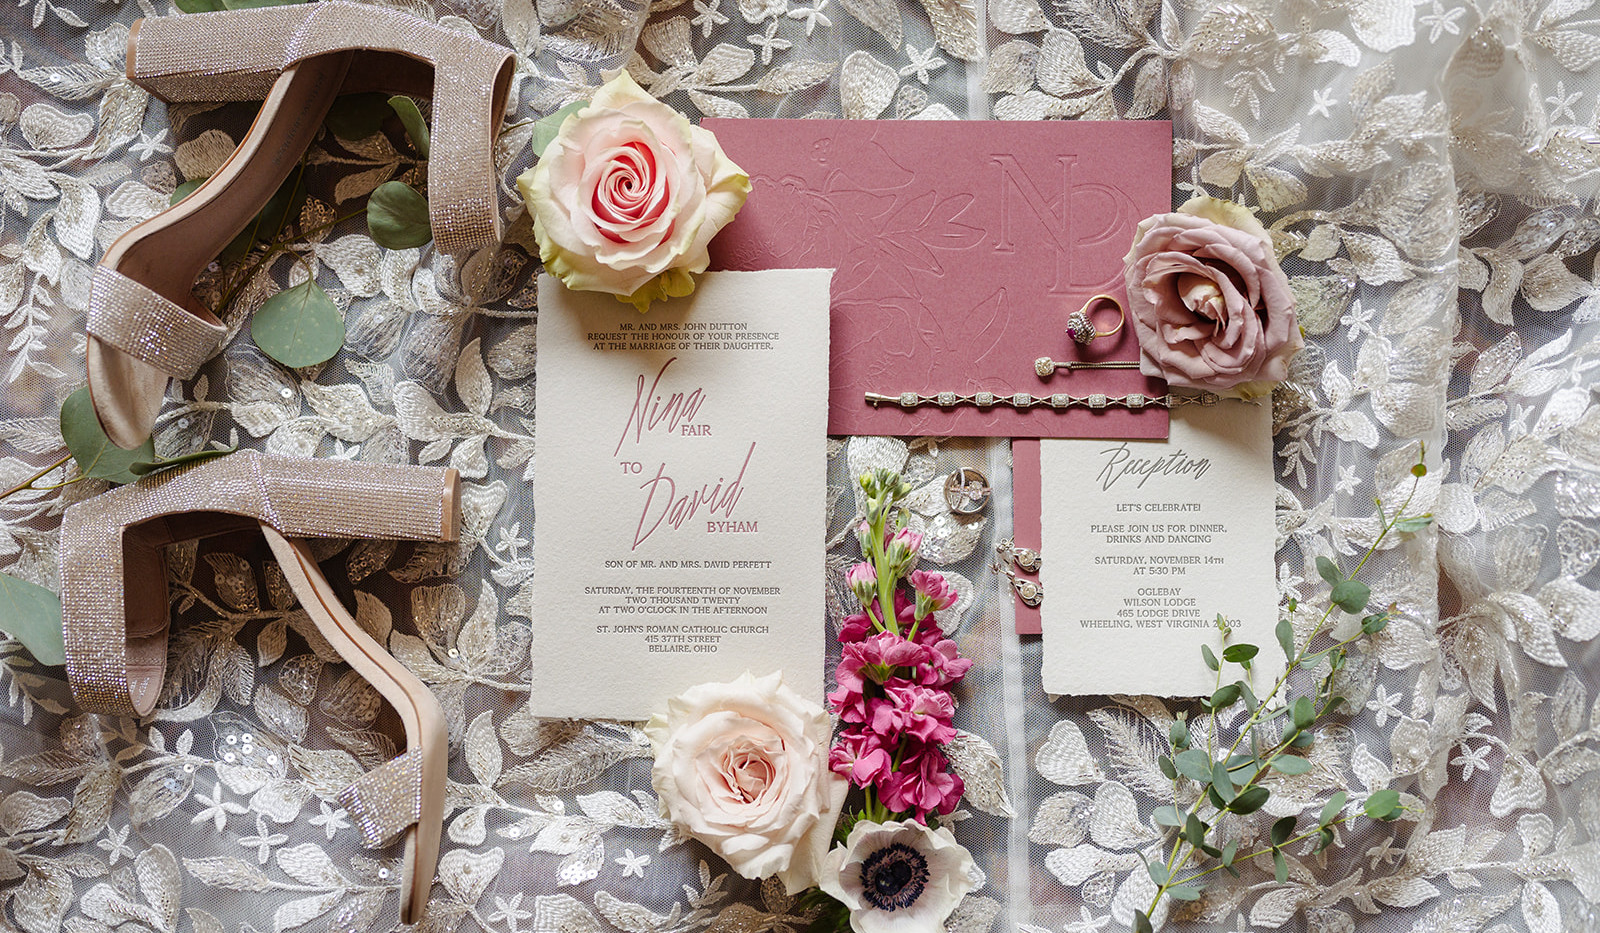 j-char-designs- letter-press-invite.jpg